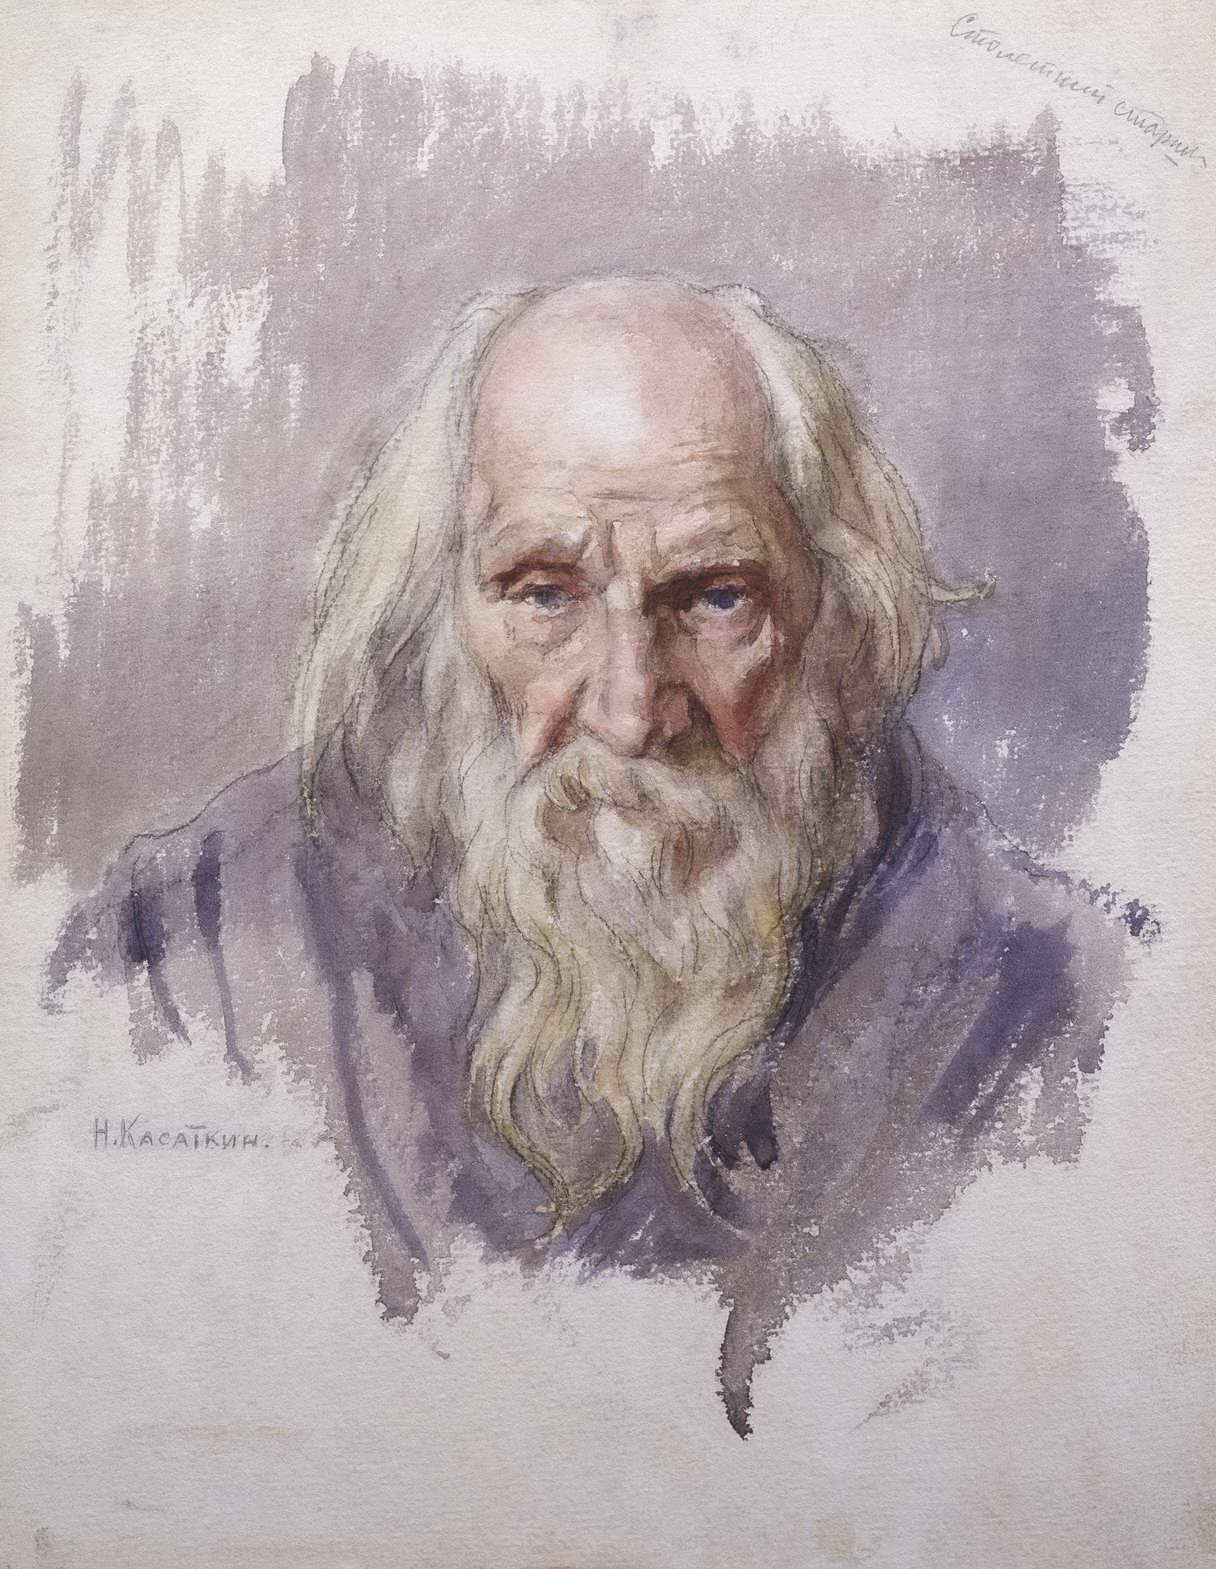 Касаткин Н.А. - Столетний старик